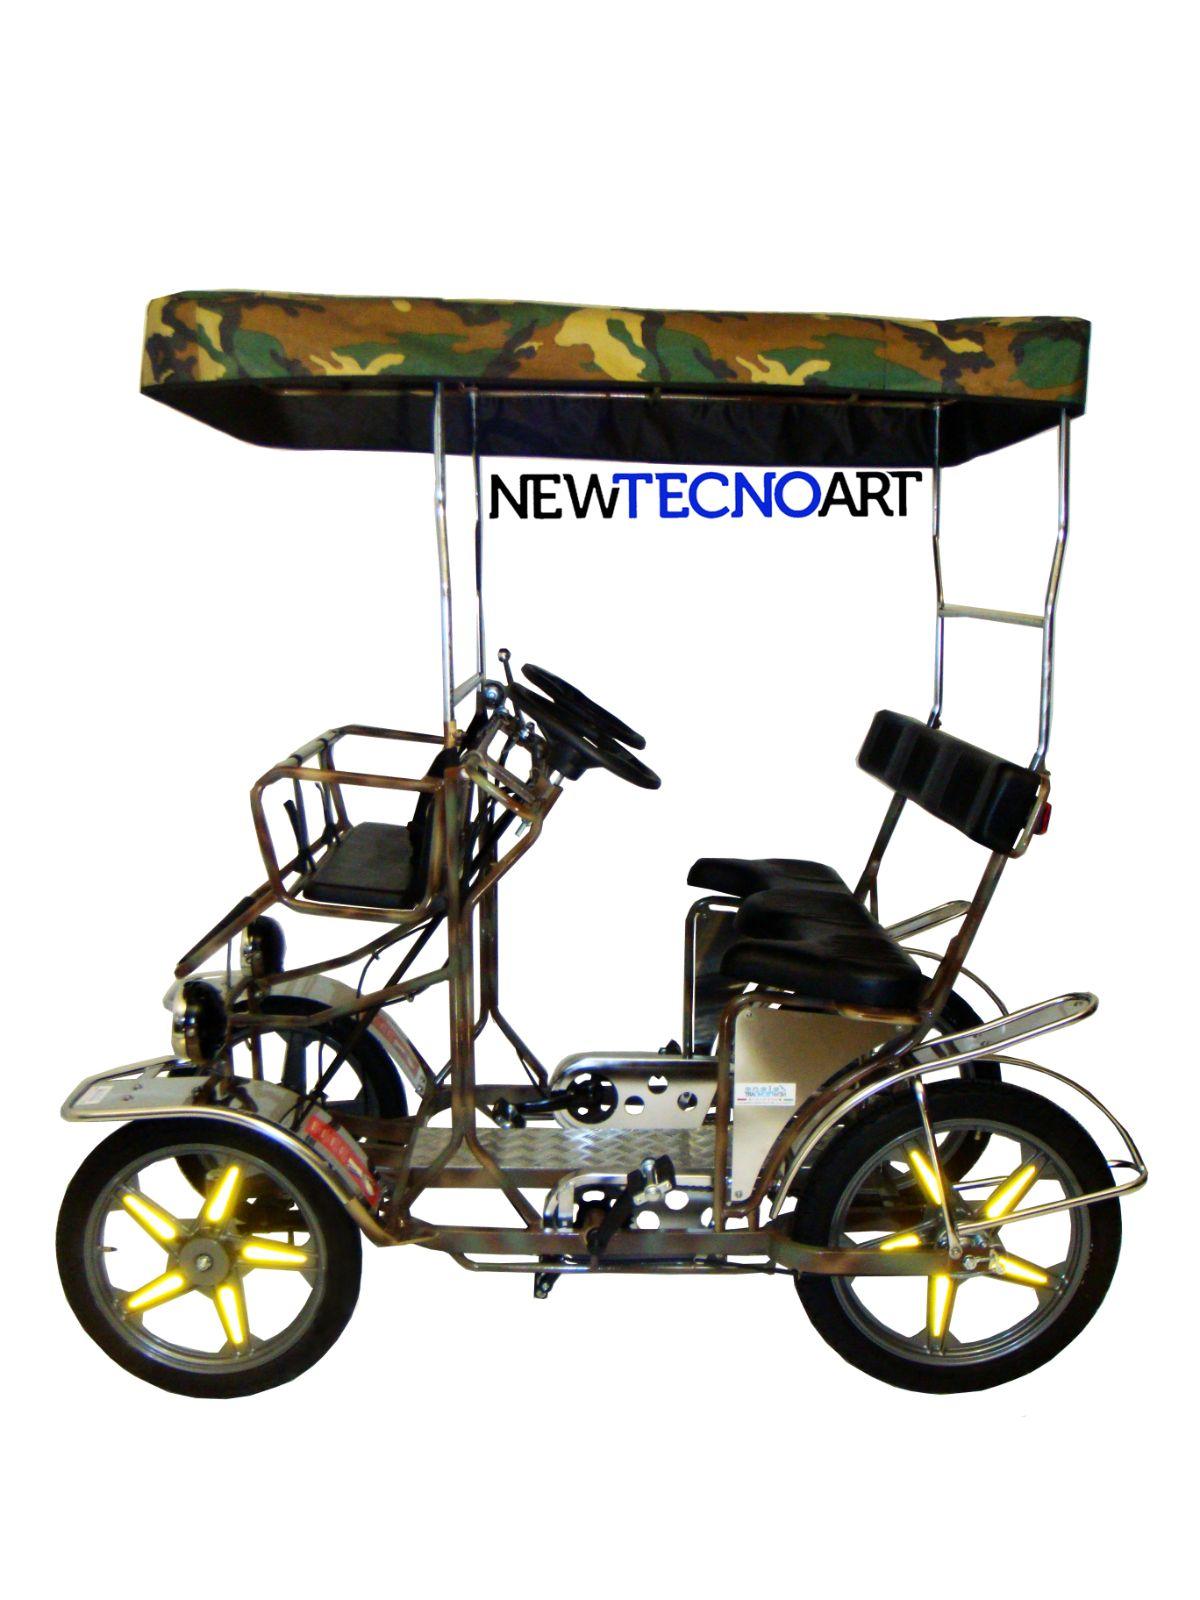 Newtecnoart safari